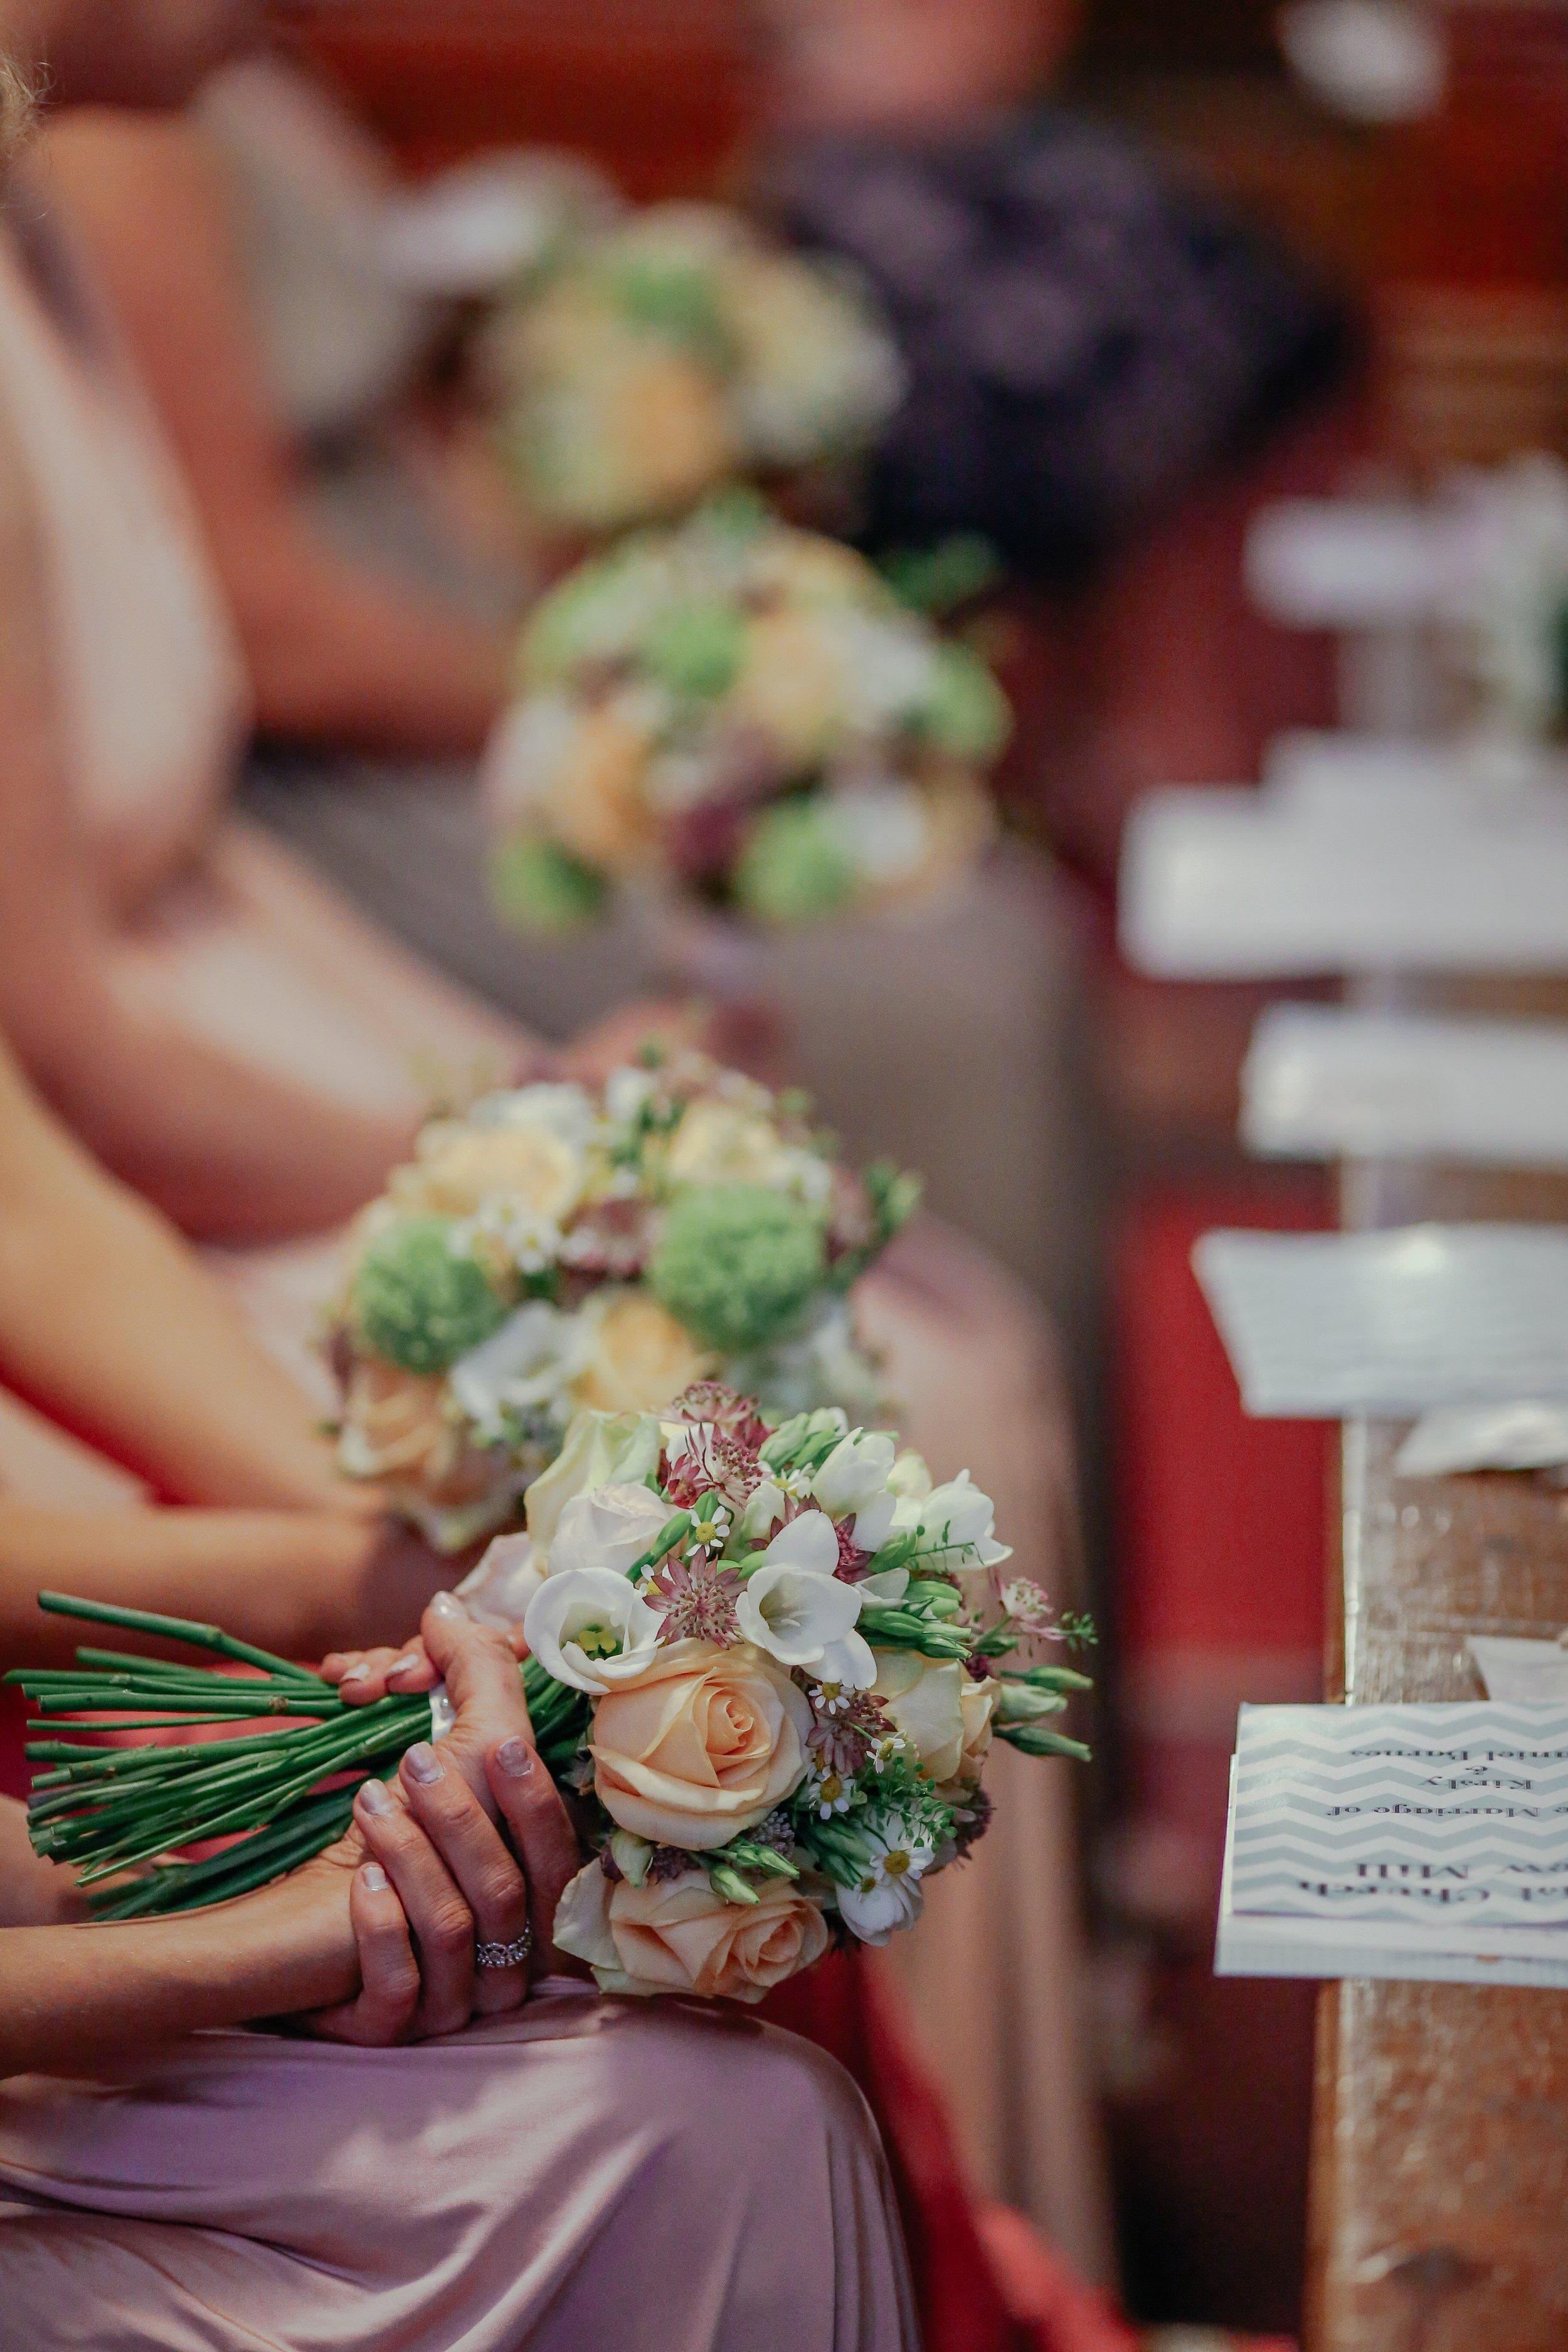 wedding-photography-627608-unsplash.jpg